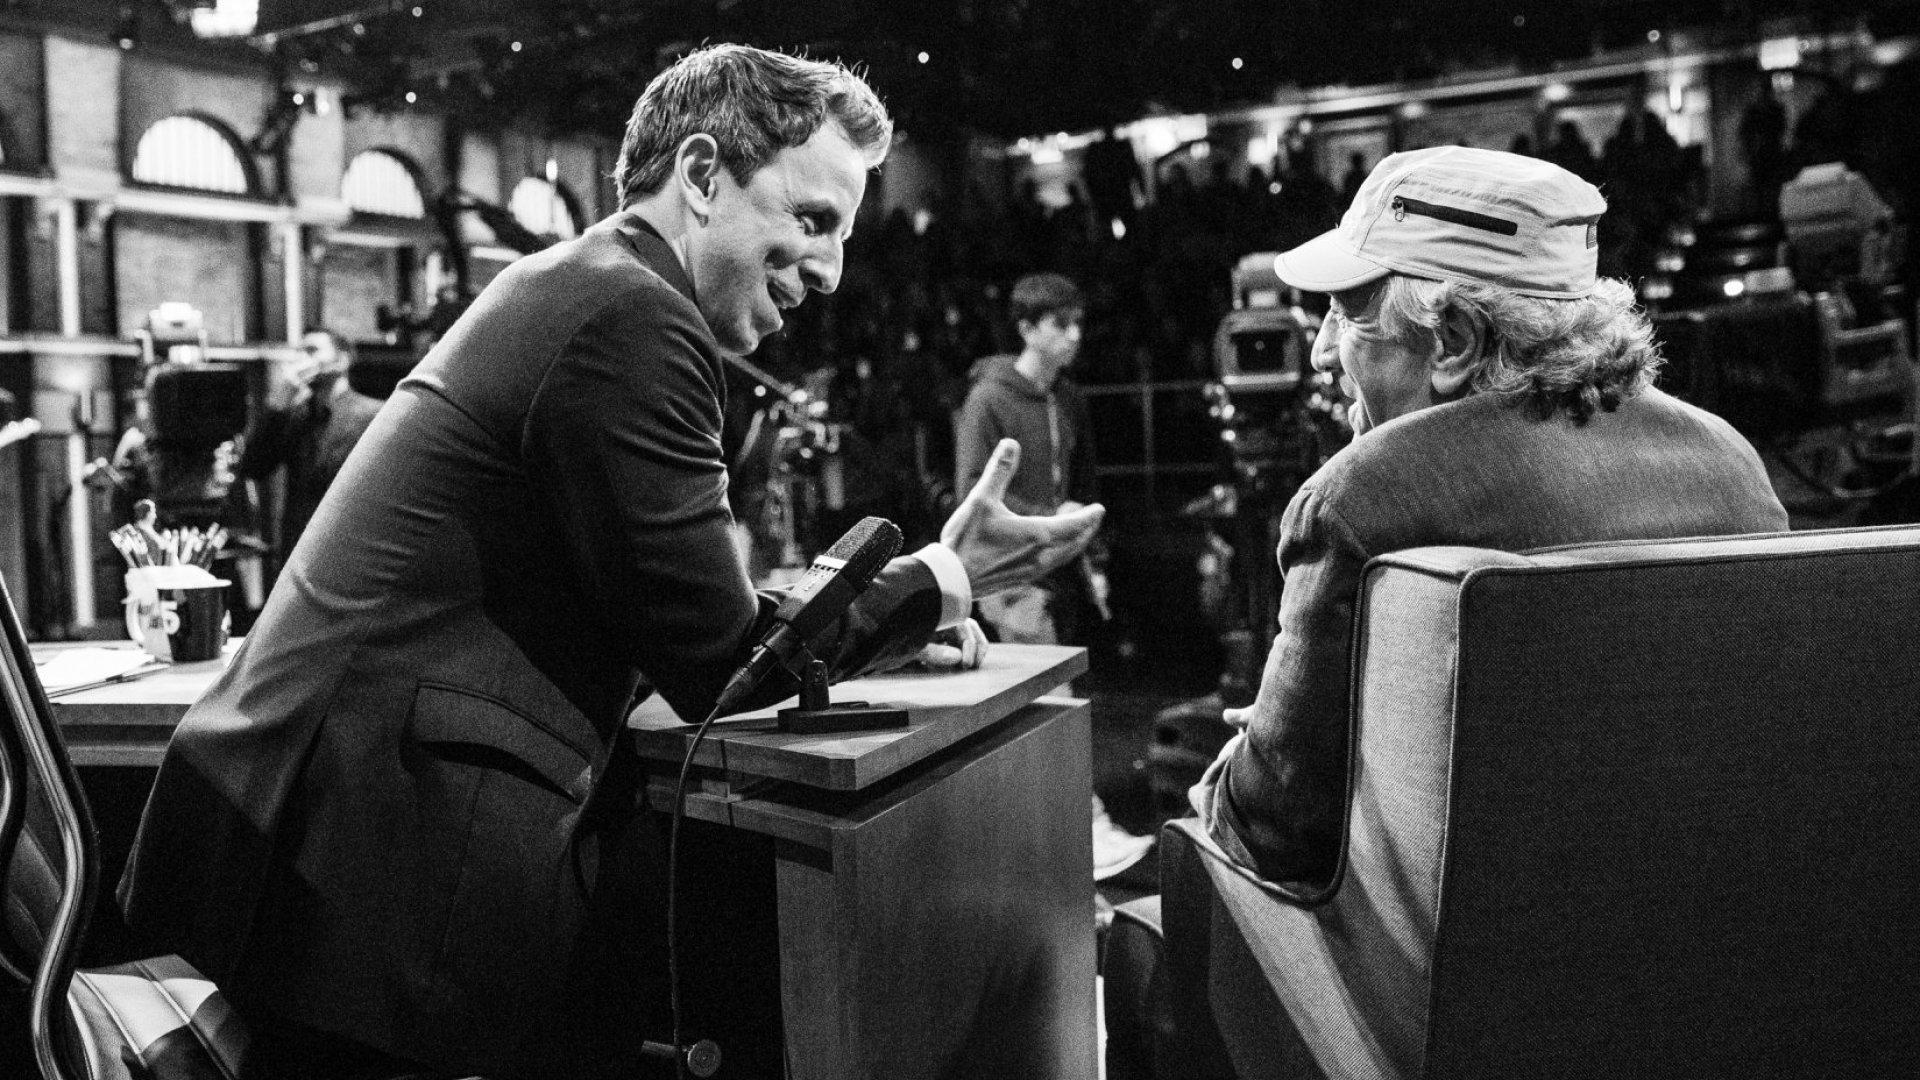 Seth Meyers (left) interviewing Robert DeNiro on <em>Late Night With Seth Meyers</em>.